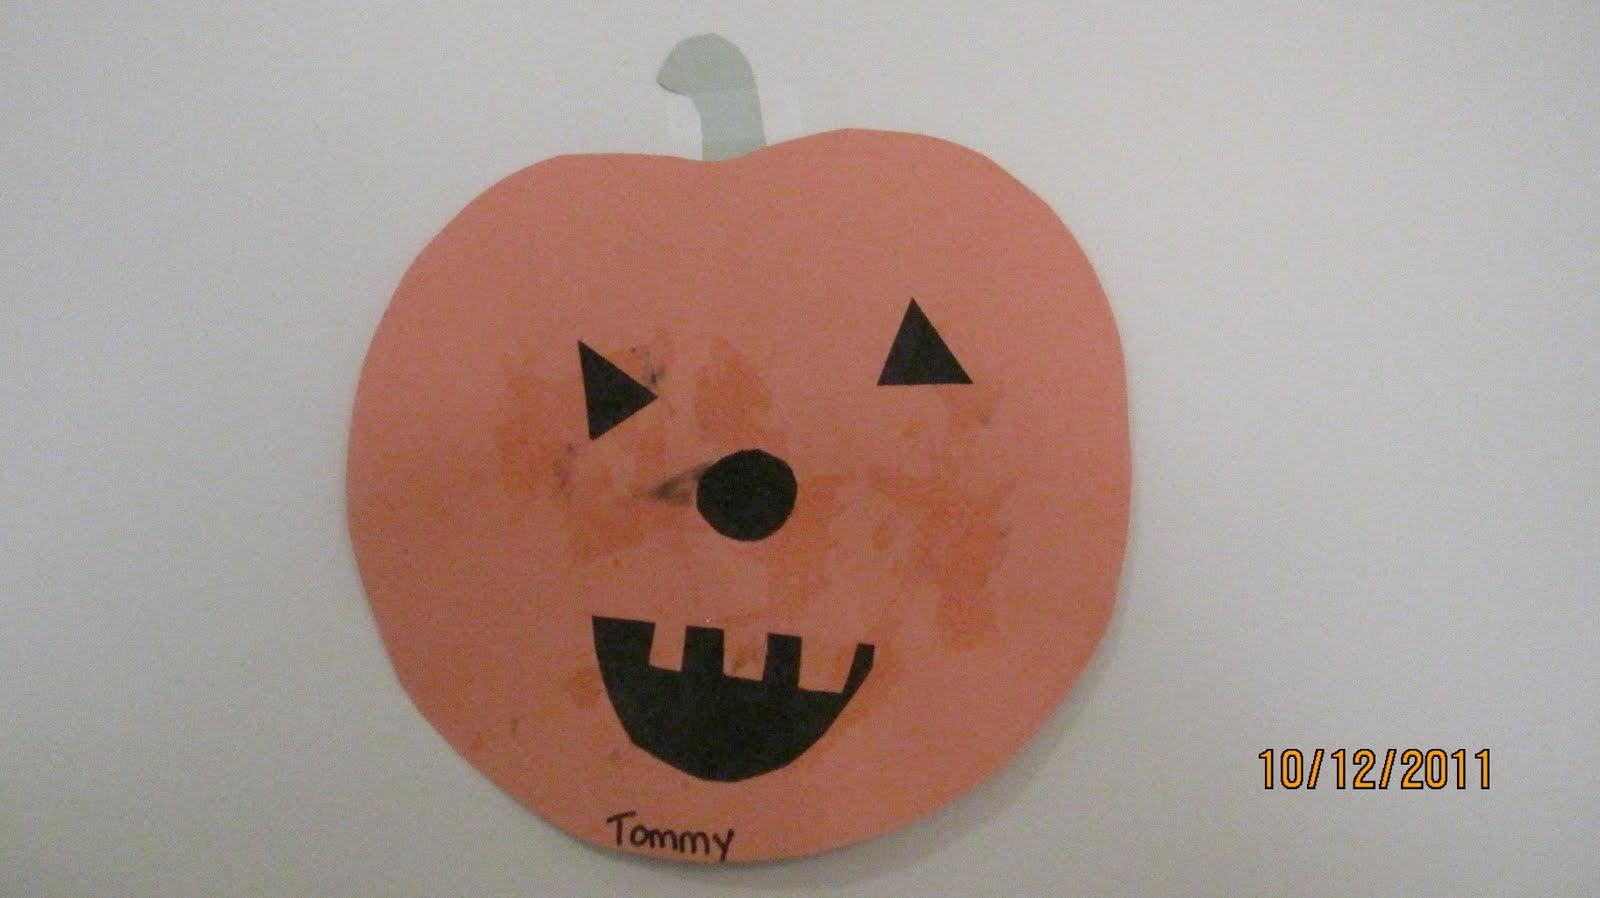 http://2.bp.blogspot.com/-6qup2n61M94/TpZSenKTwDI/AAAAAAAAAfc/p5z0LiKHft8/s1600/Halloween%2B001.JPG